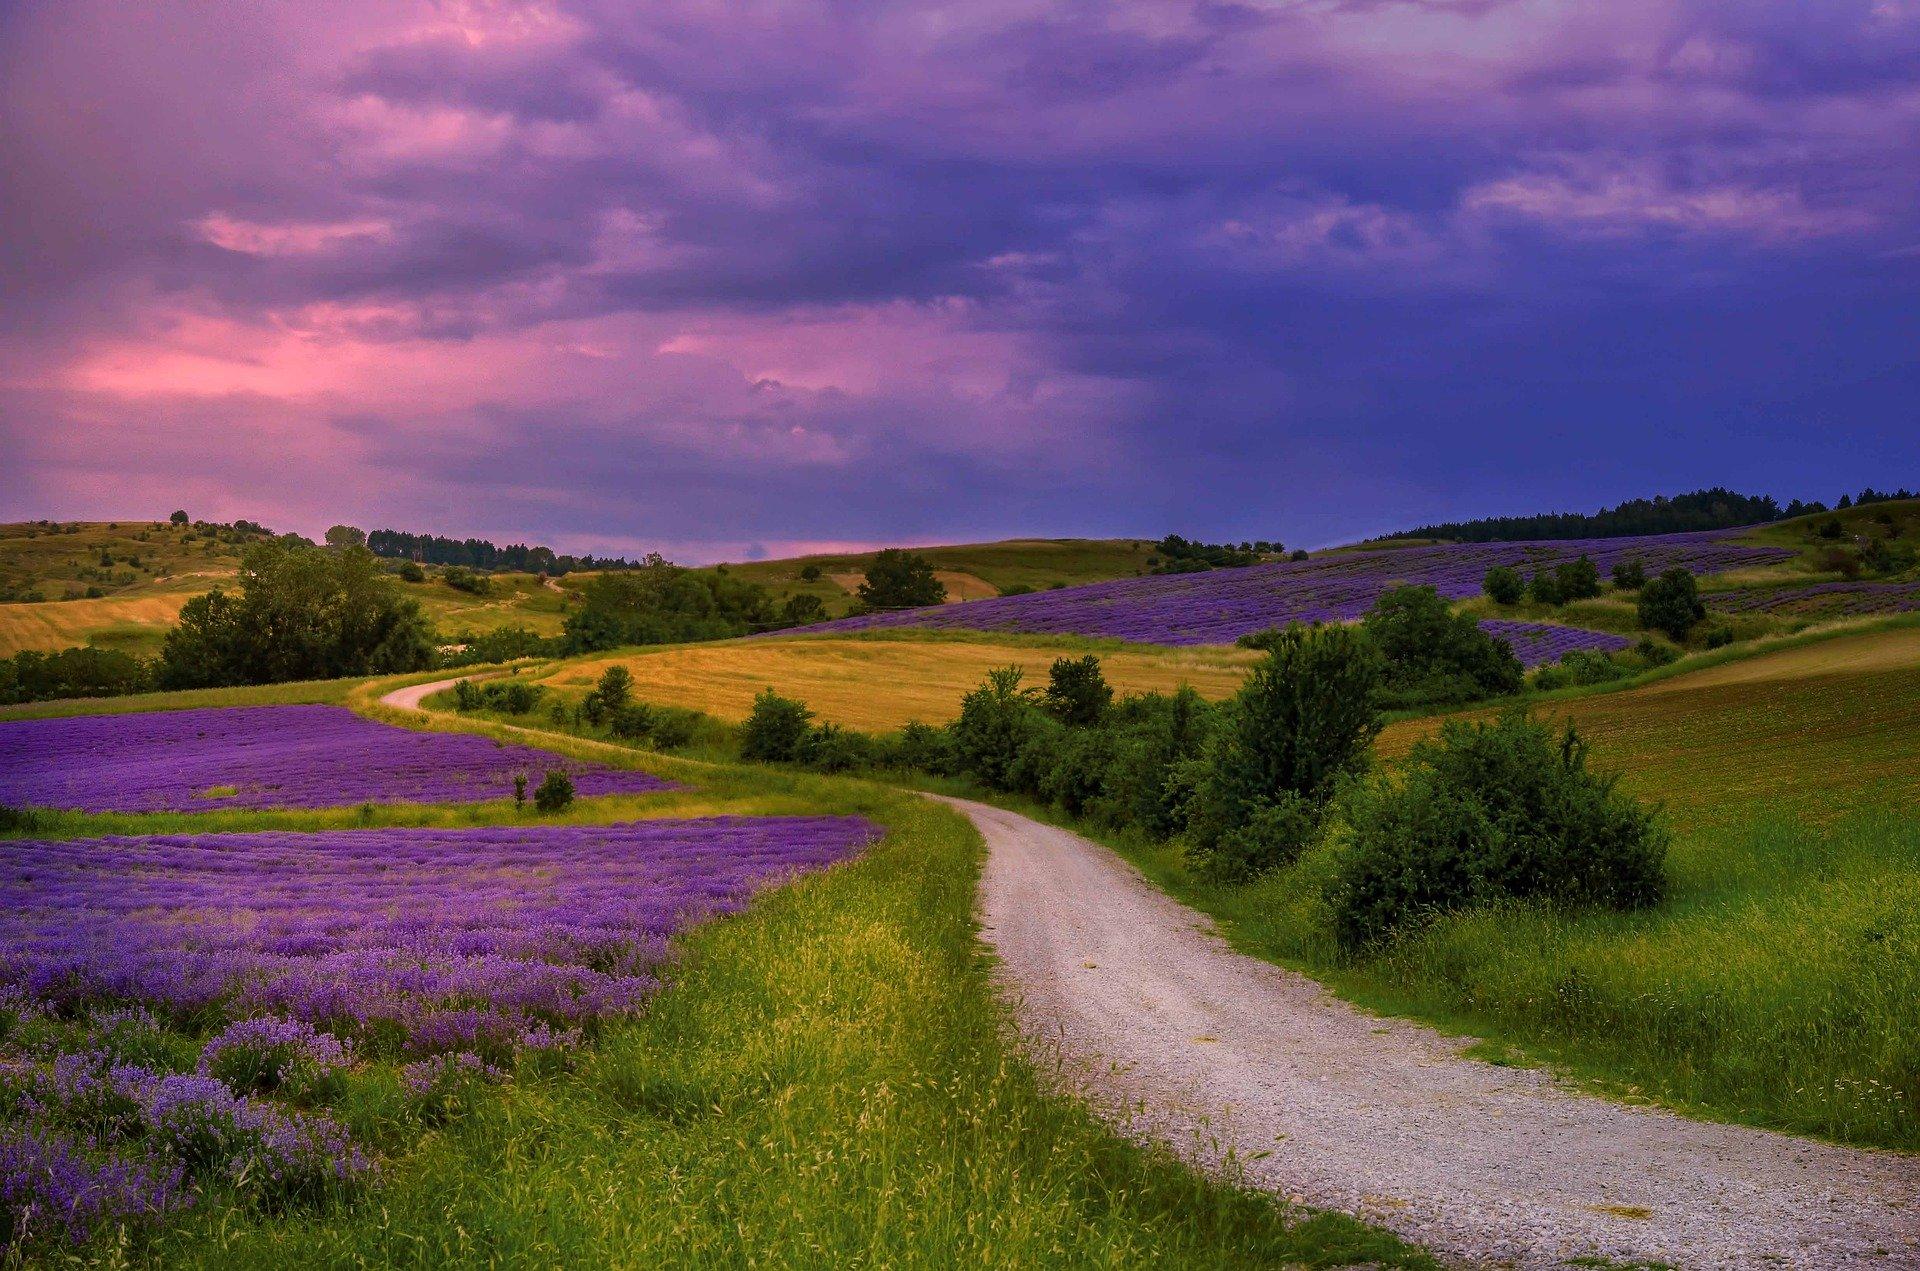 lavender-4673090_1920